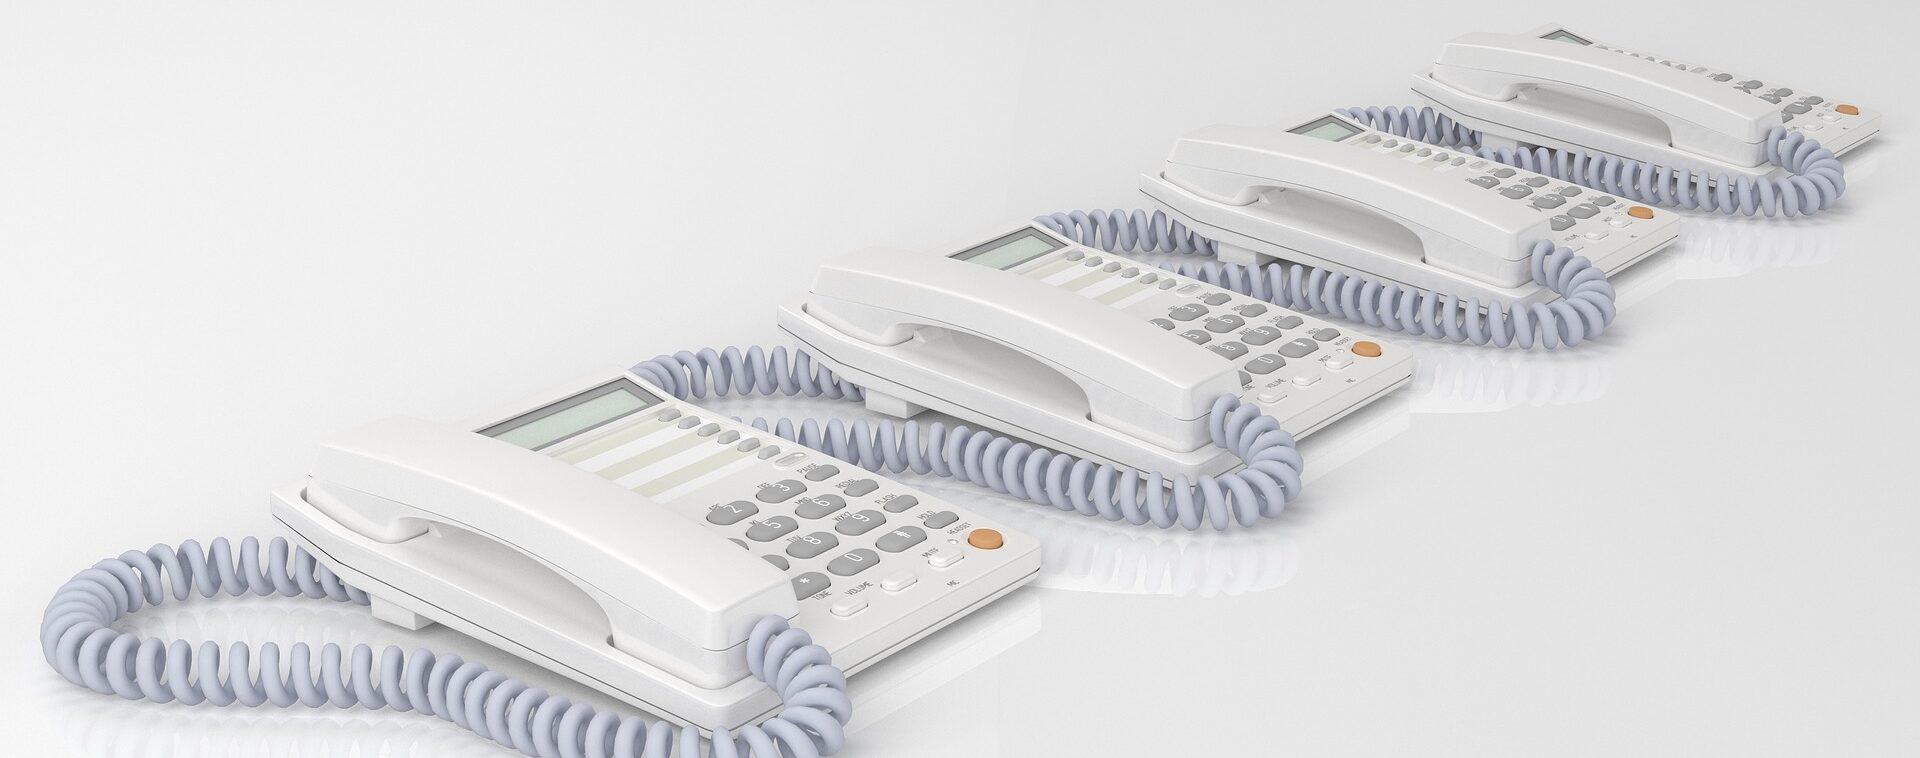 телефон разговор